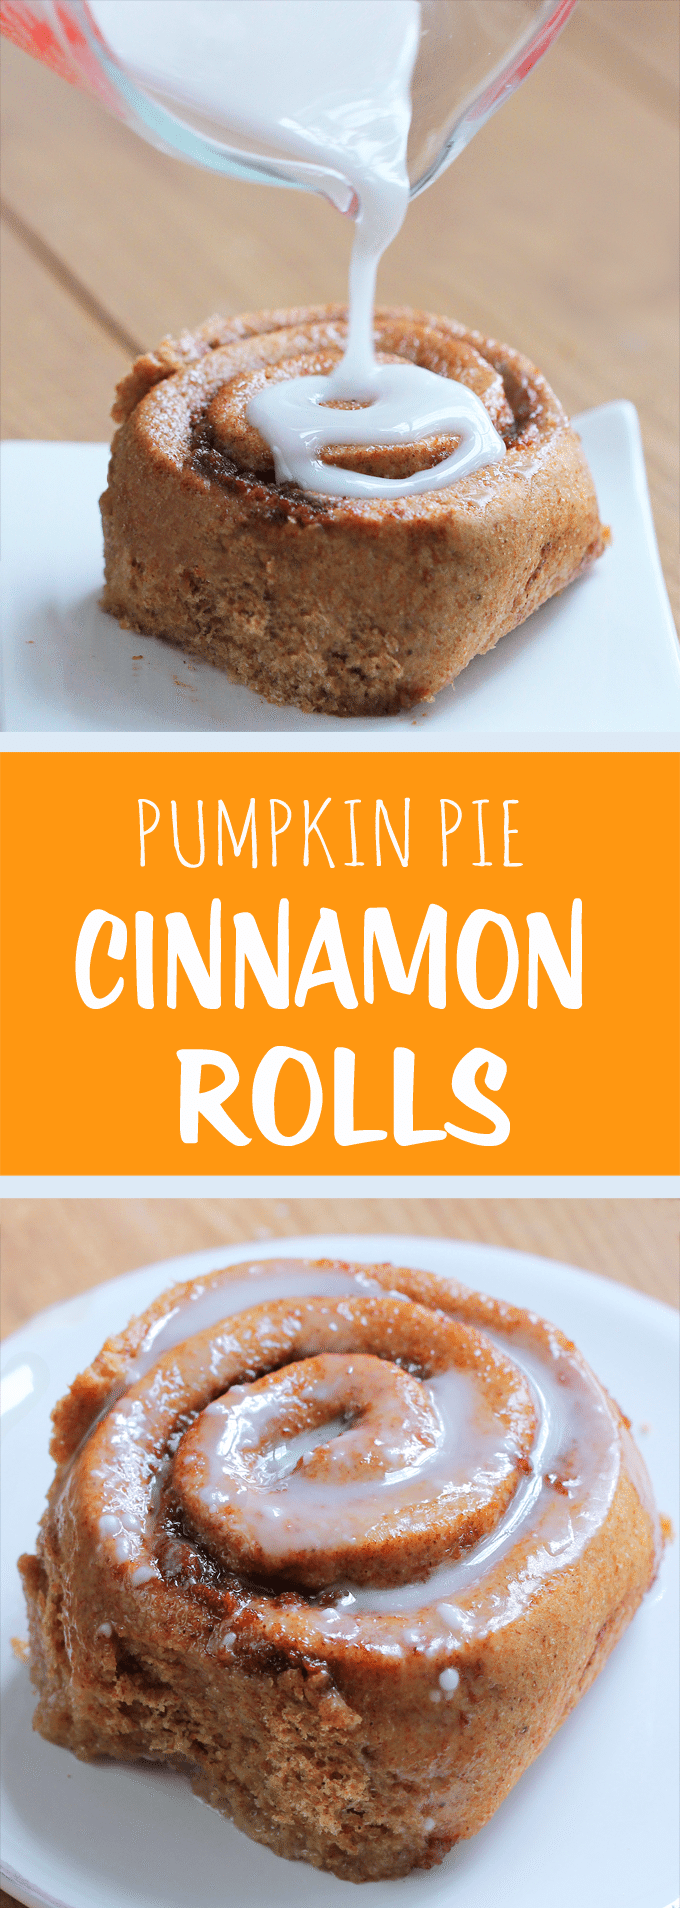 Pumpkin Cinnamon Rolls - Ingredients: 1 cup pumpkin, 2 tsp vanilla extract, 2 tbsp baking powder, 1/4 cup... Full recipe: https://chocolatecoveredkatie.com/2013/10/22/pumpkin-cinnamon-rolls/ @choccoveredkt